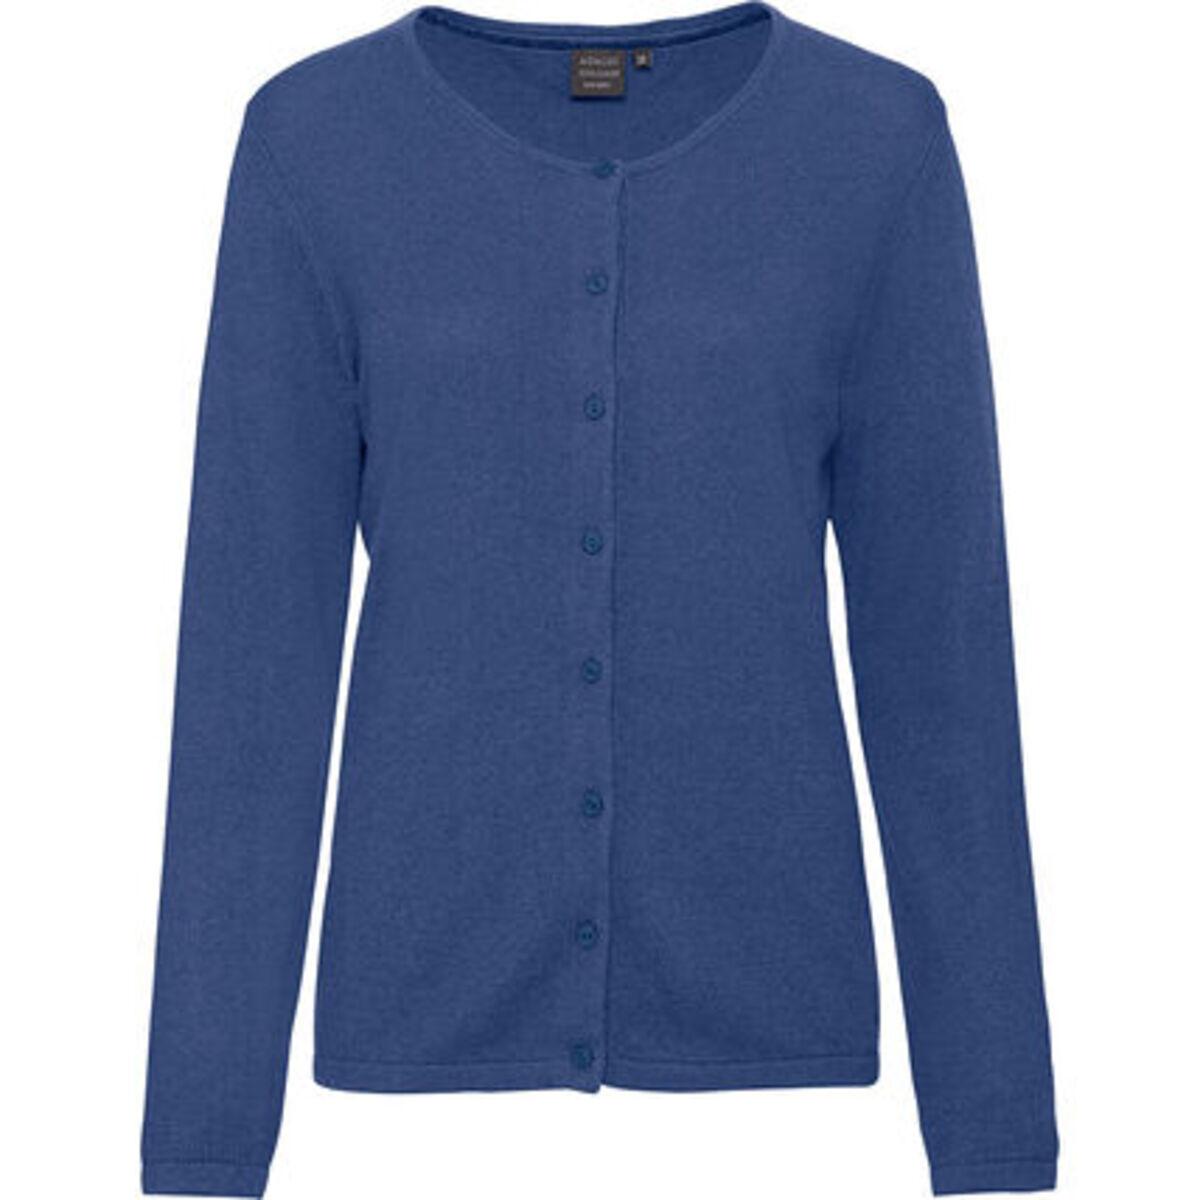 Bild 1 von Adagio Damen Seide-Cashmere Cardigan, jeansblau, 46, 46